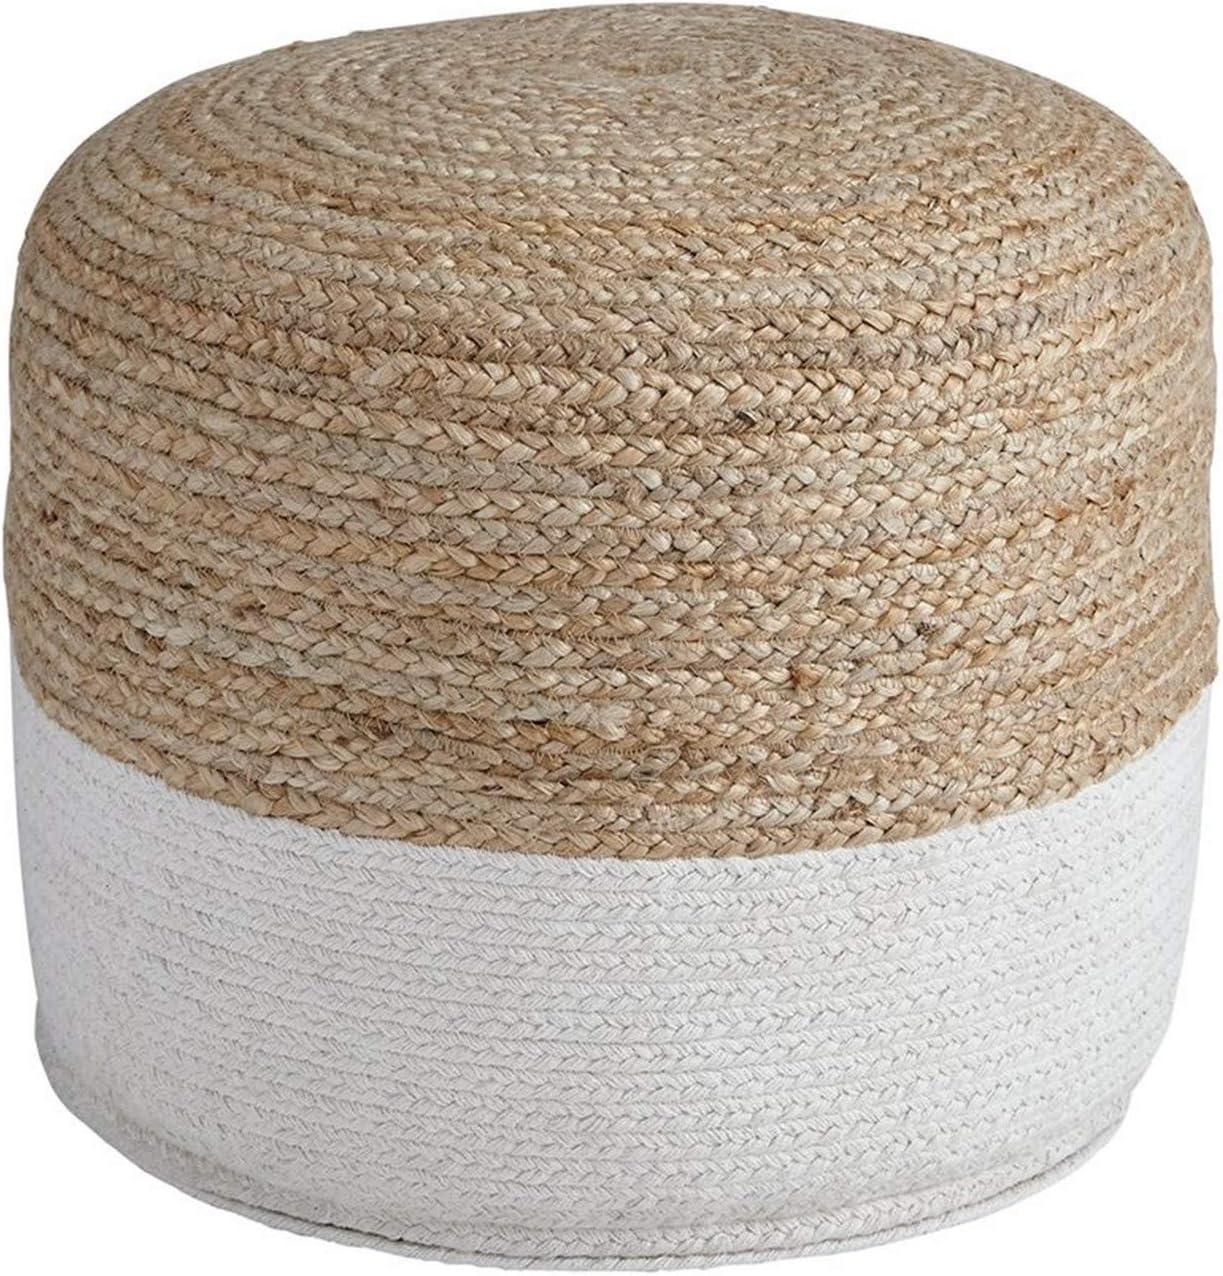 Benjara Fabric 2021 Round Pouf Very popular with Whit Jute Braided Brown Pattern